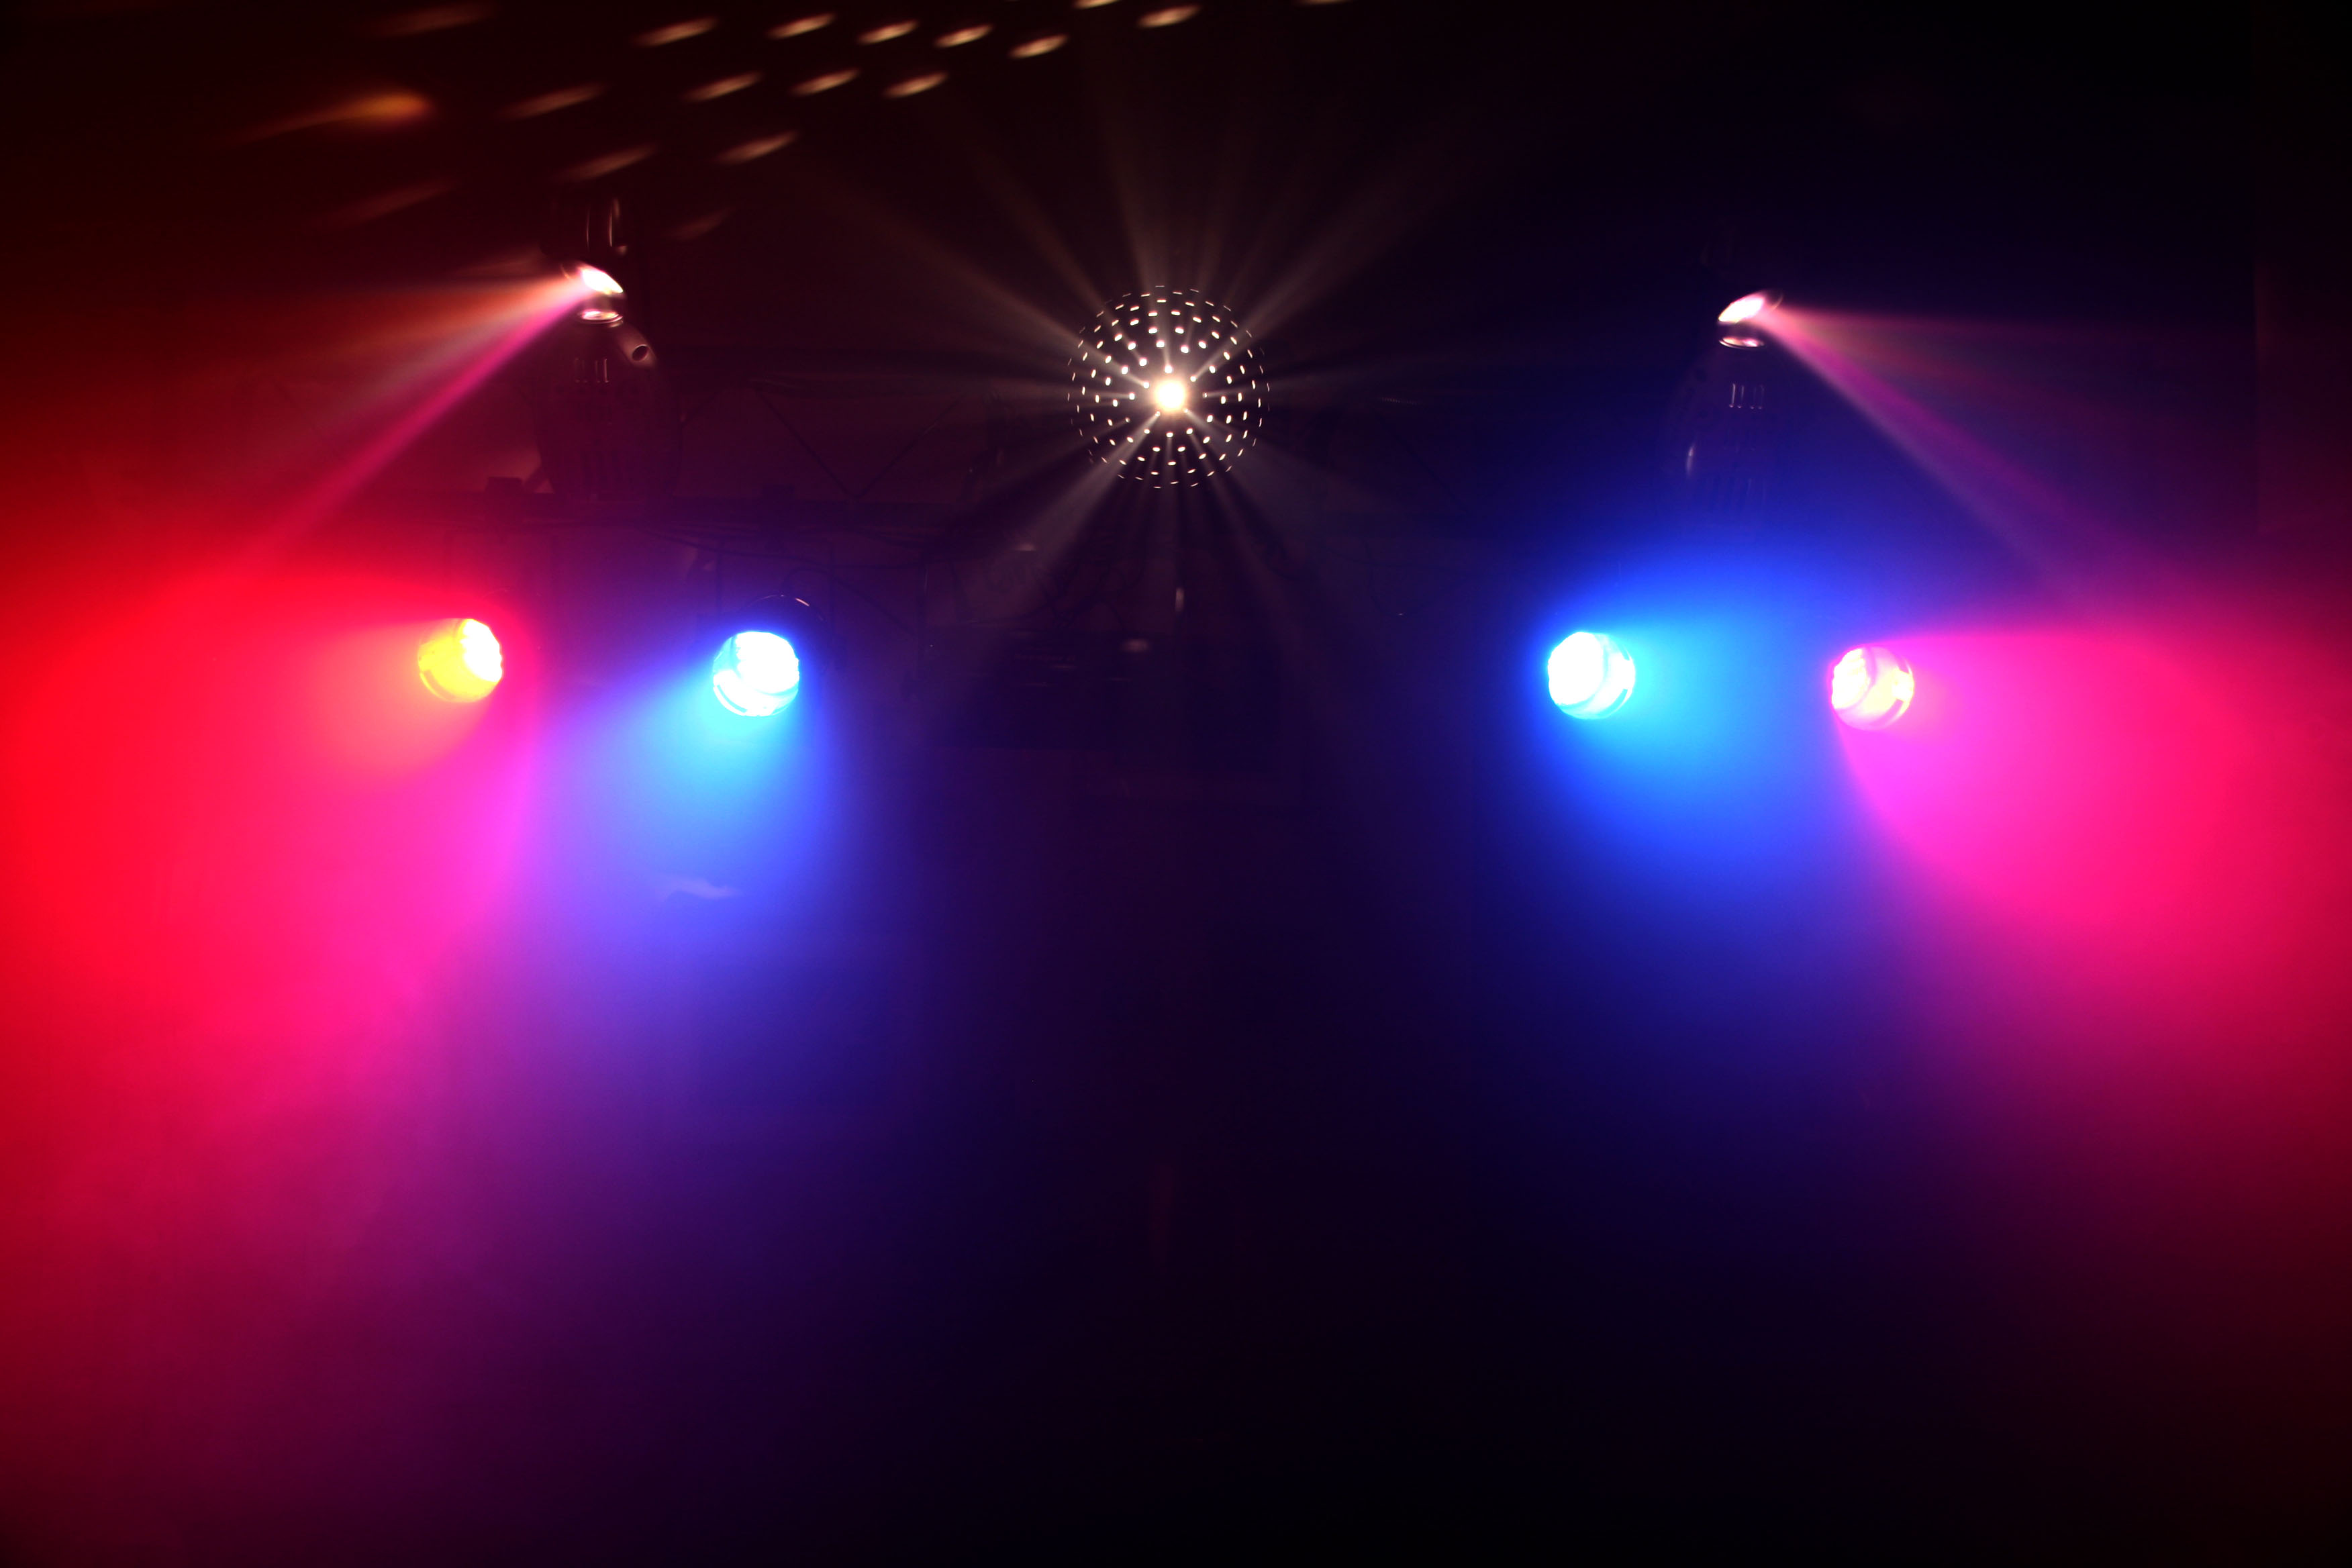 color images changer play lighting medias m light audiofanzine polished dj stage pictures image adj a american pak